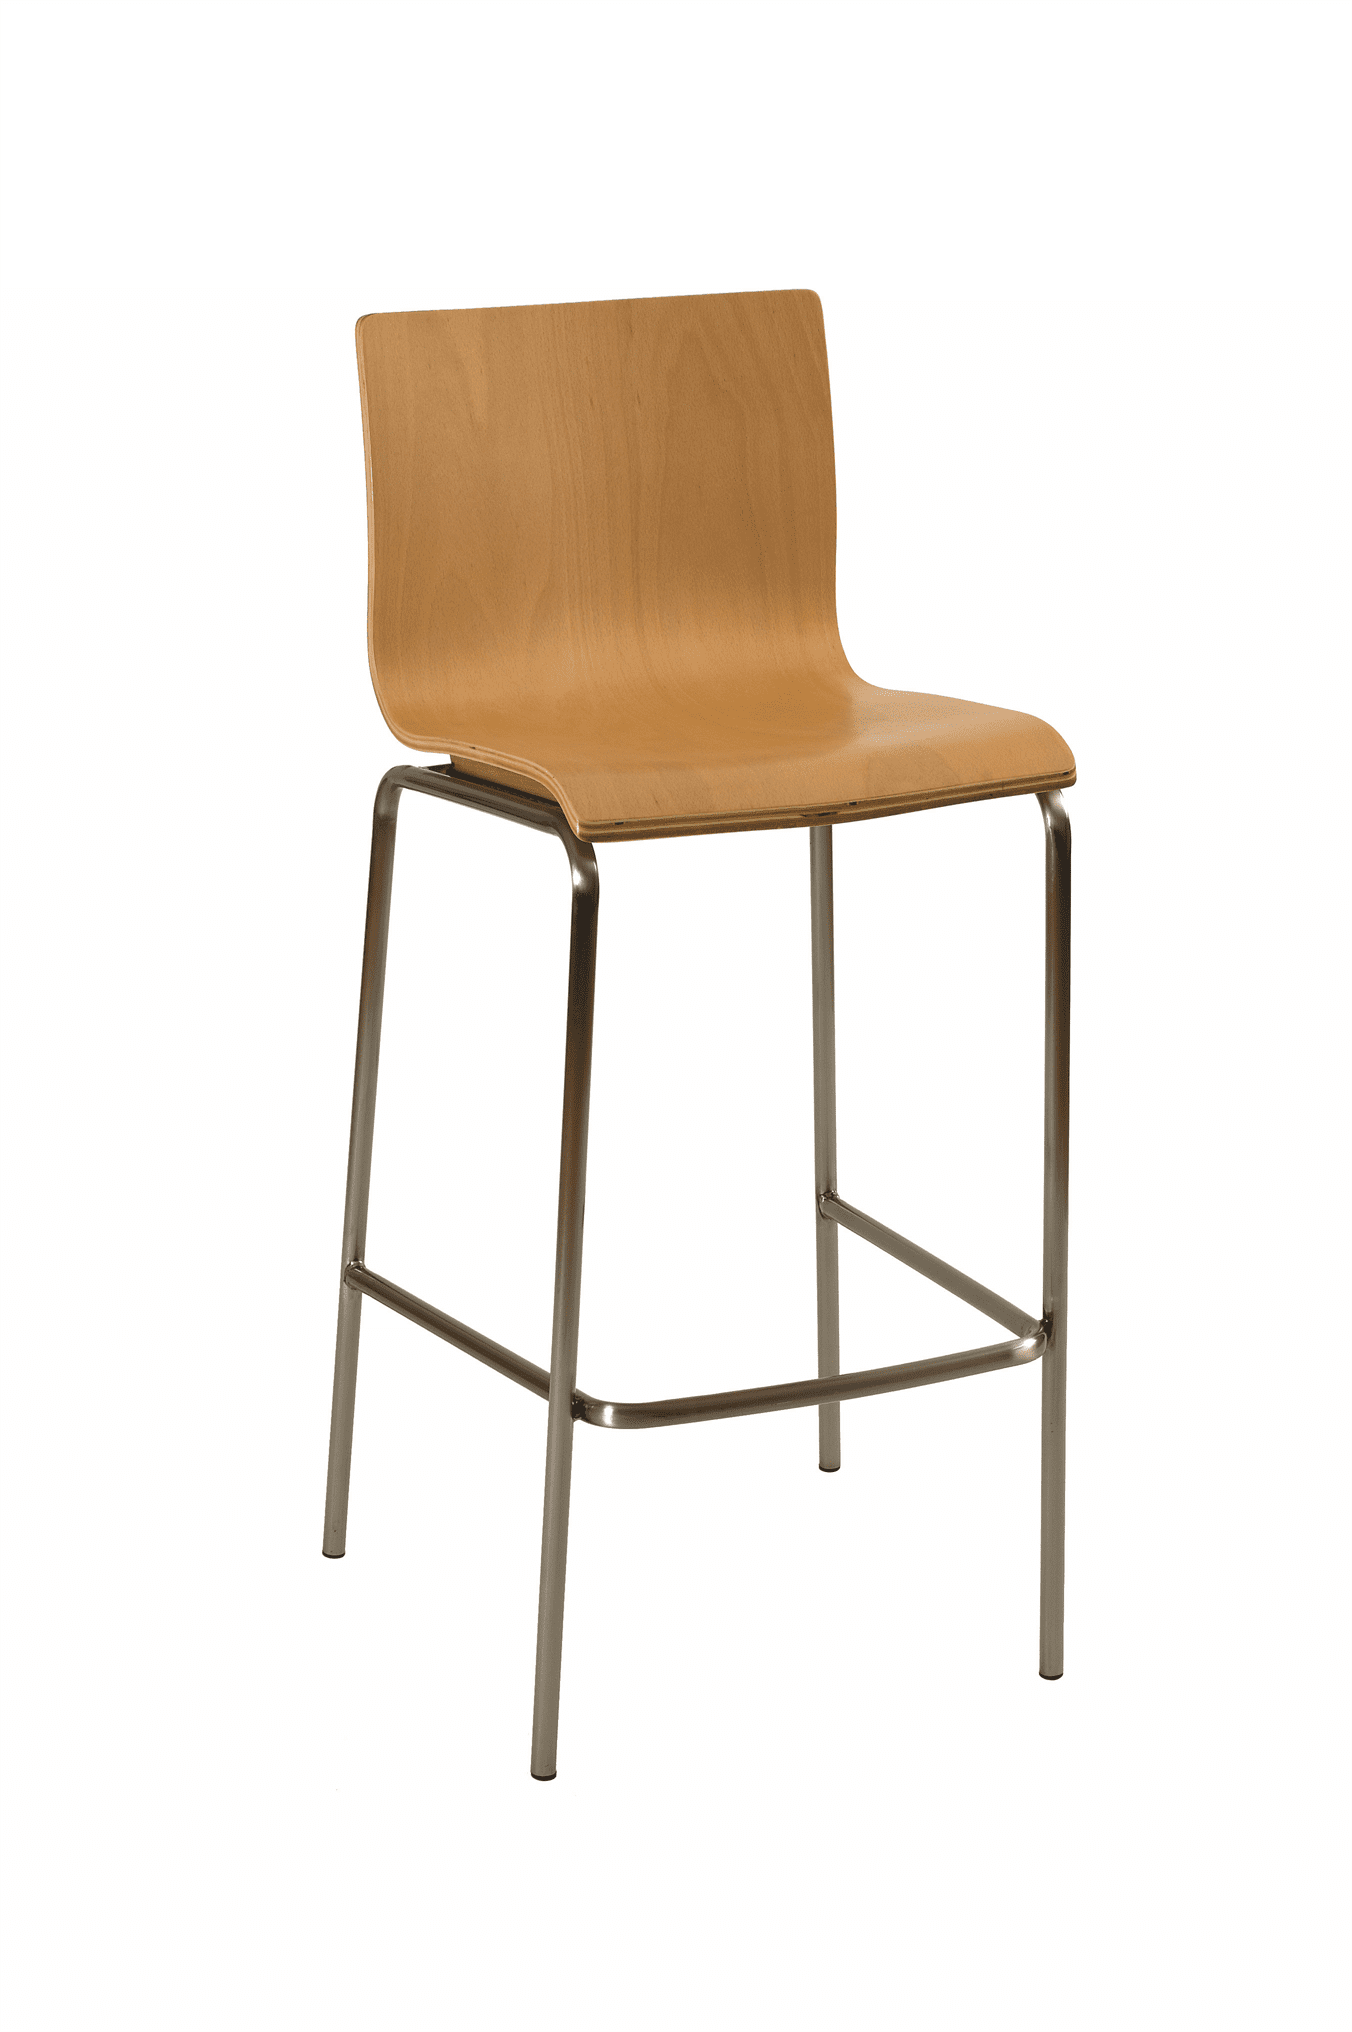 Hale stacking bar stool beech veneer natural